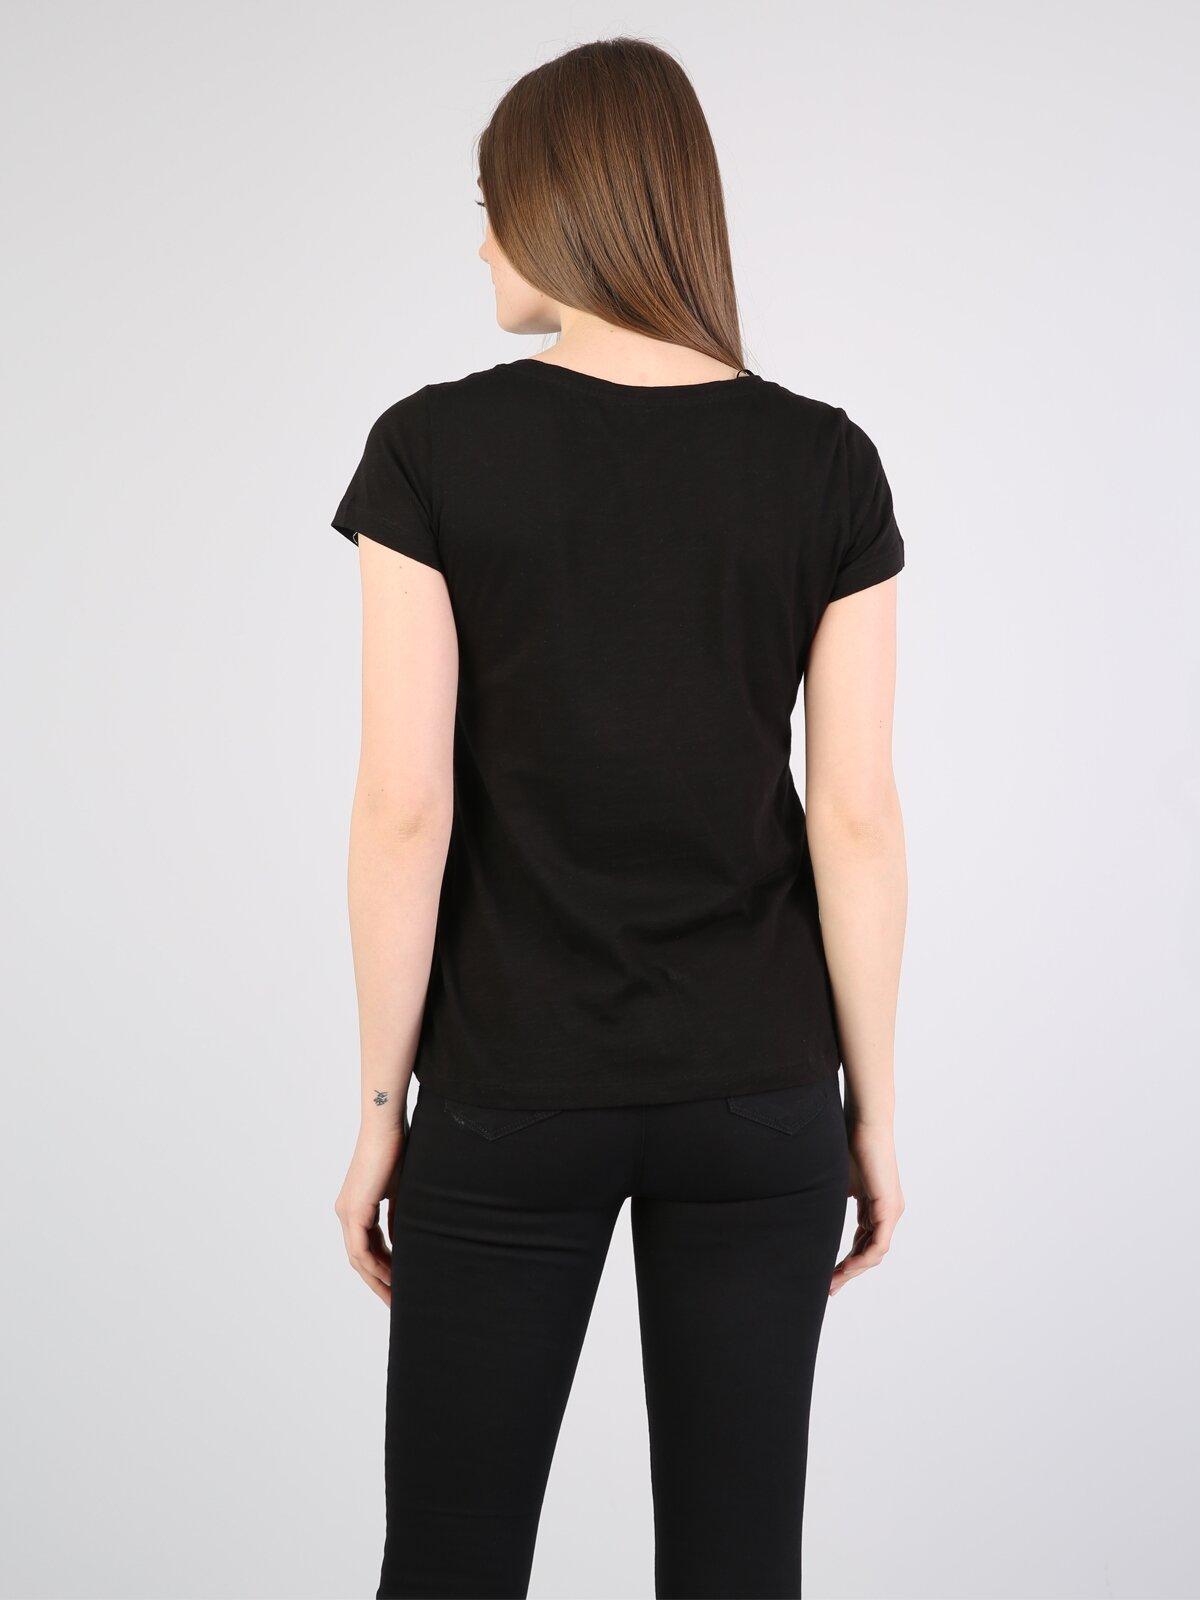 Slim Fit Siyah Kadın Kısa Kol Tişört